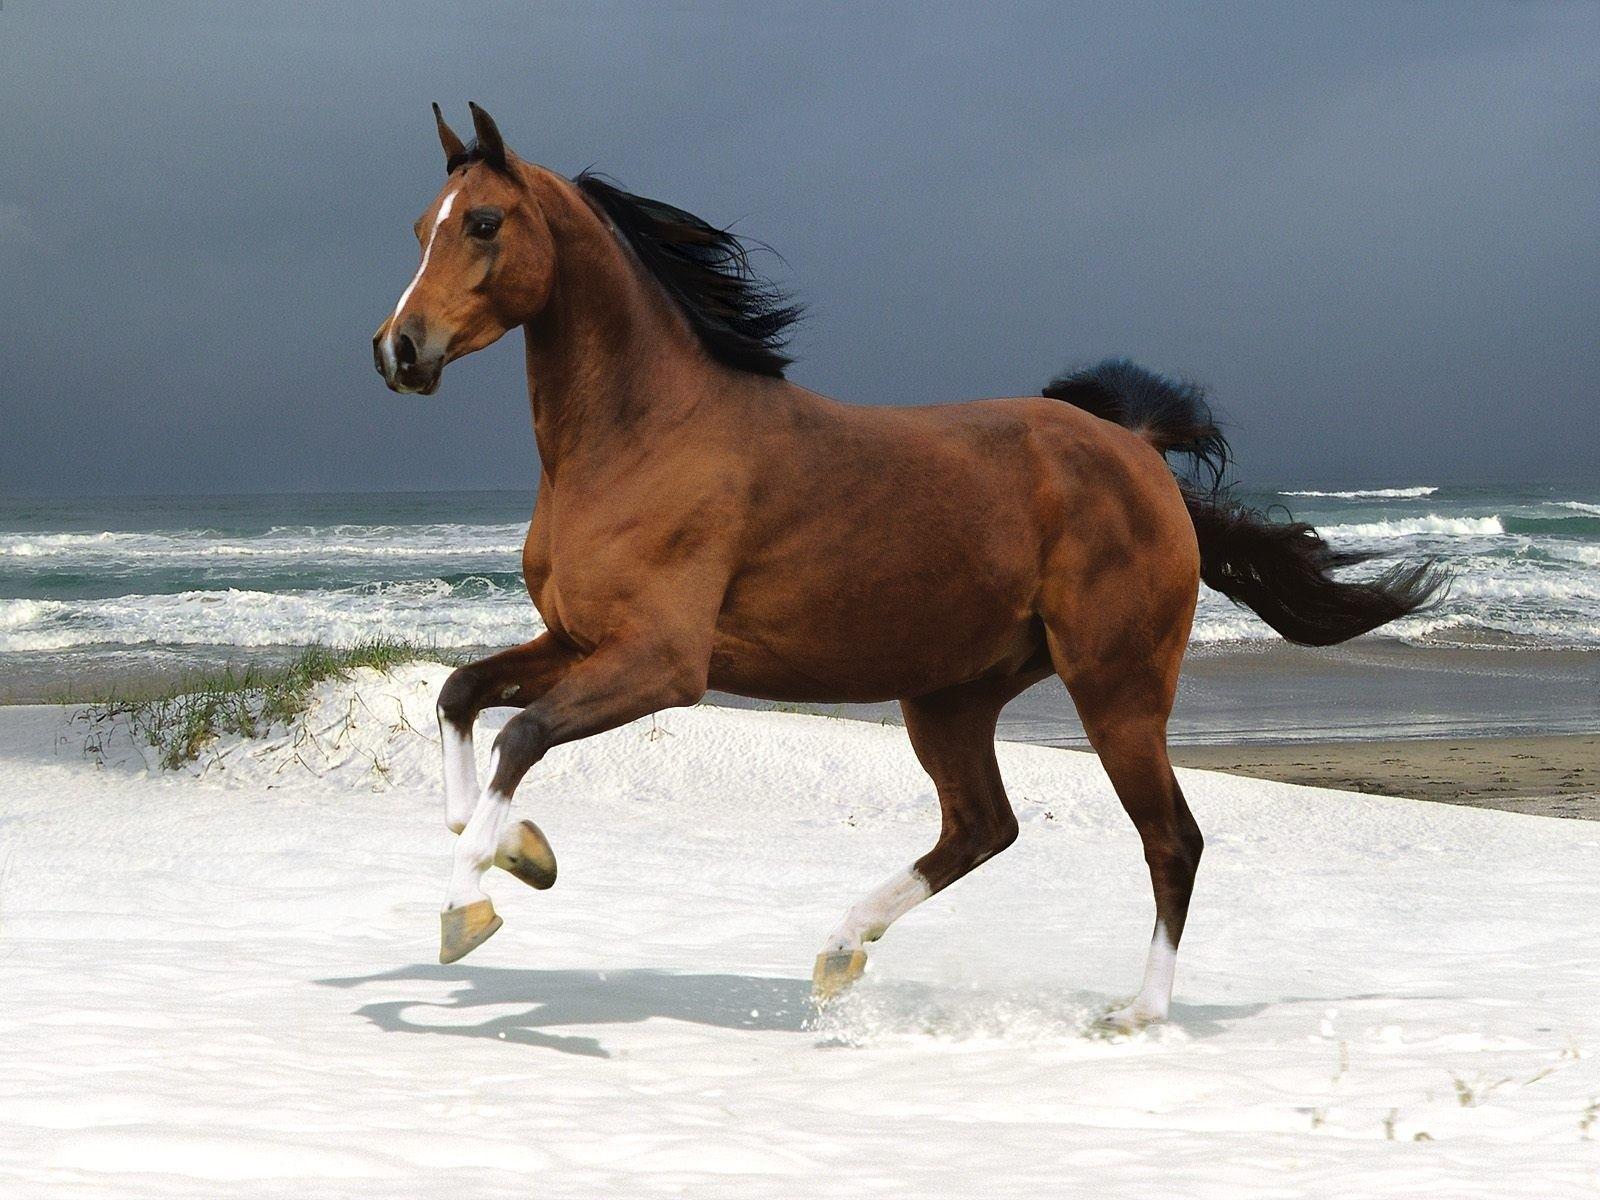 Simple Wallpaper Horse Beach - 817fcddecfa0621e28a5a109768ba985  Image_64145.jpg